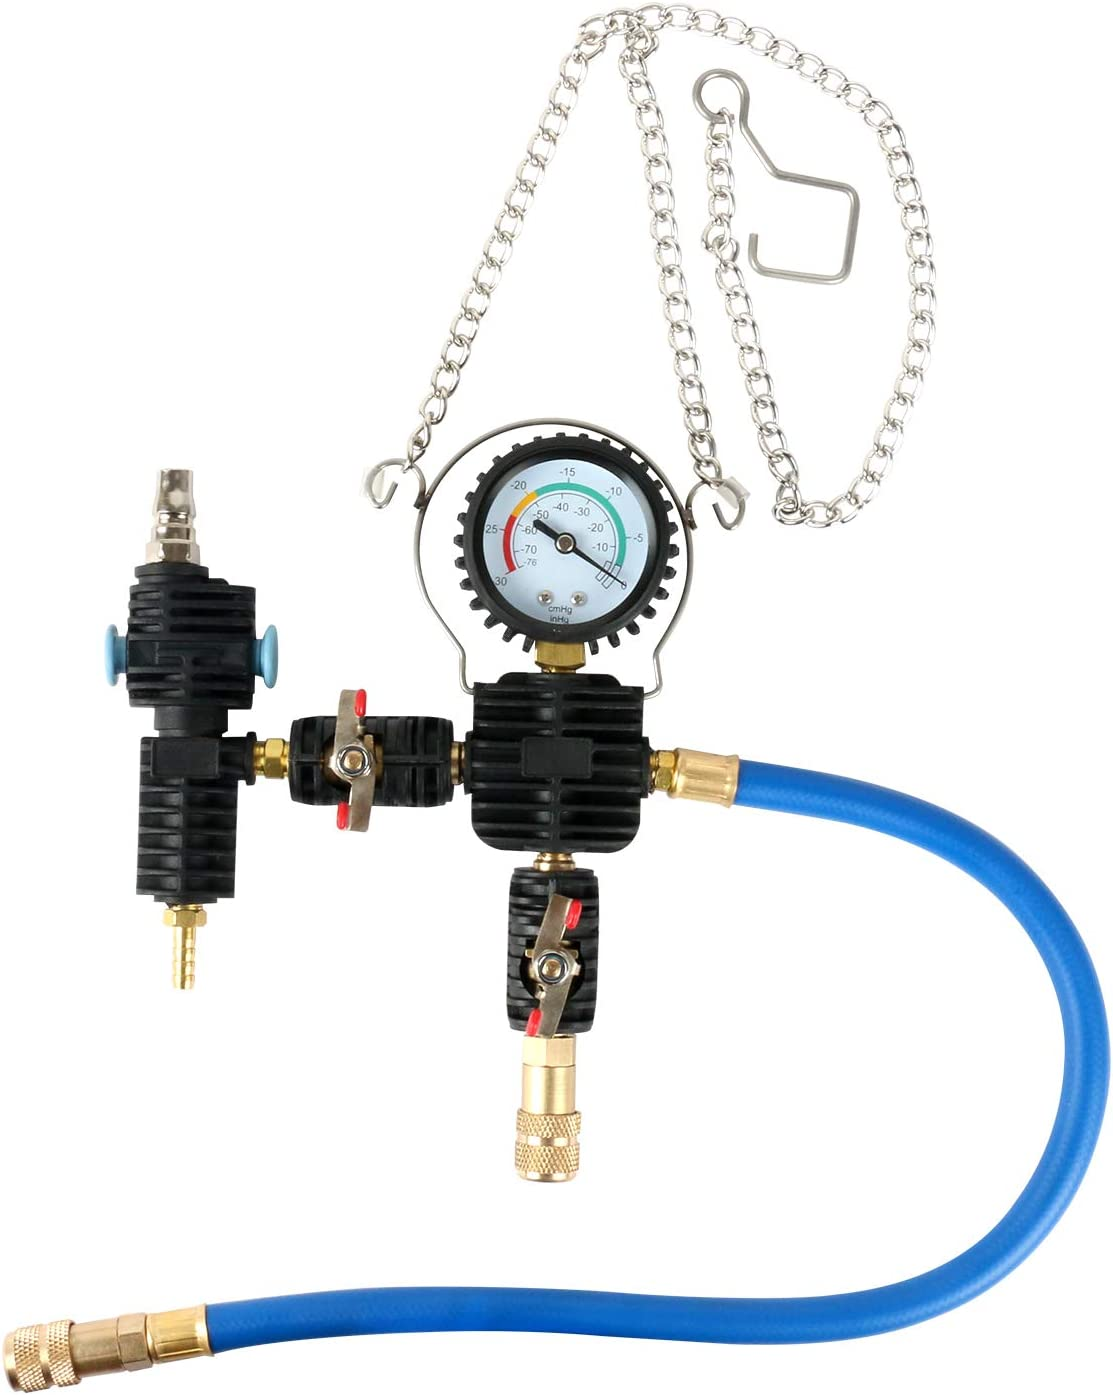 OIMERRY 28PCS Universal Radiator Pressure Tester for Vehicles Vacuum Type Coolant System Pressure Leak Tester Kit